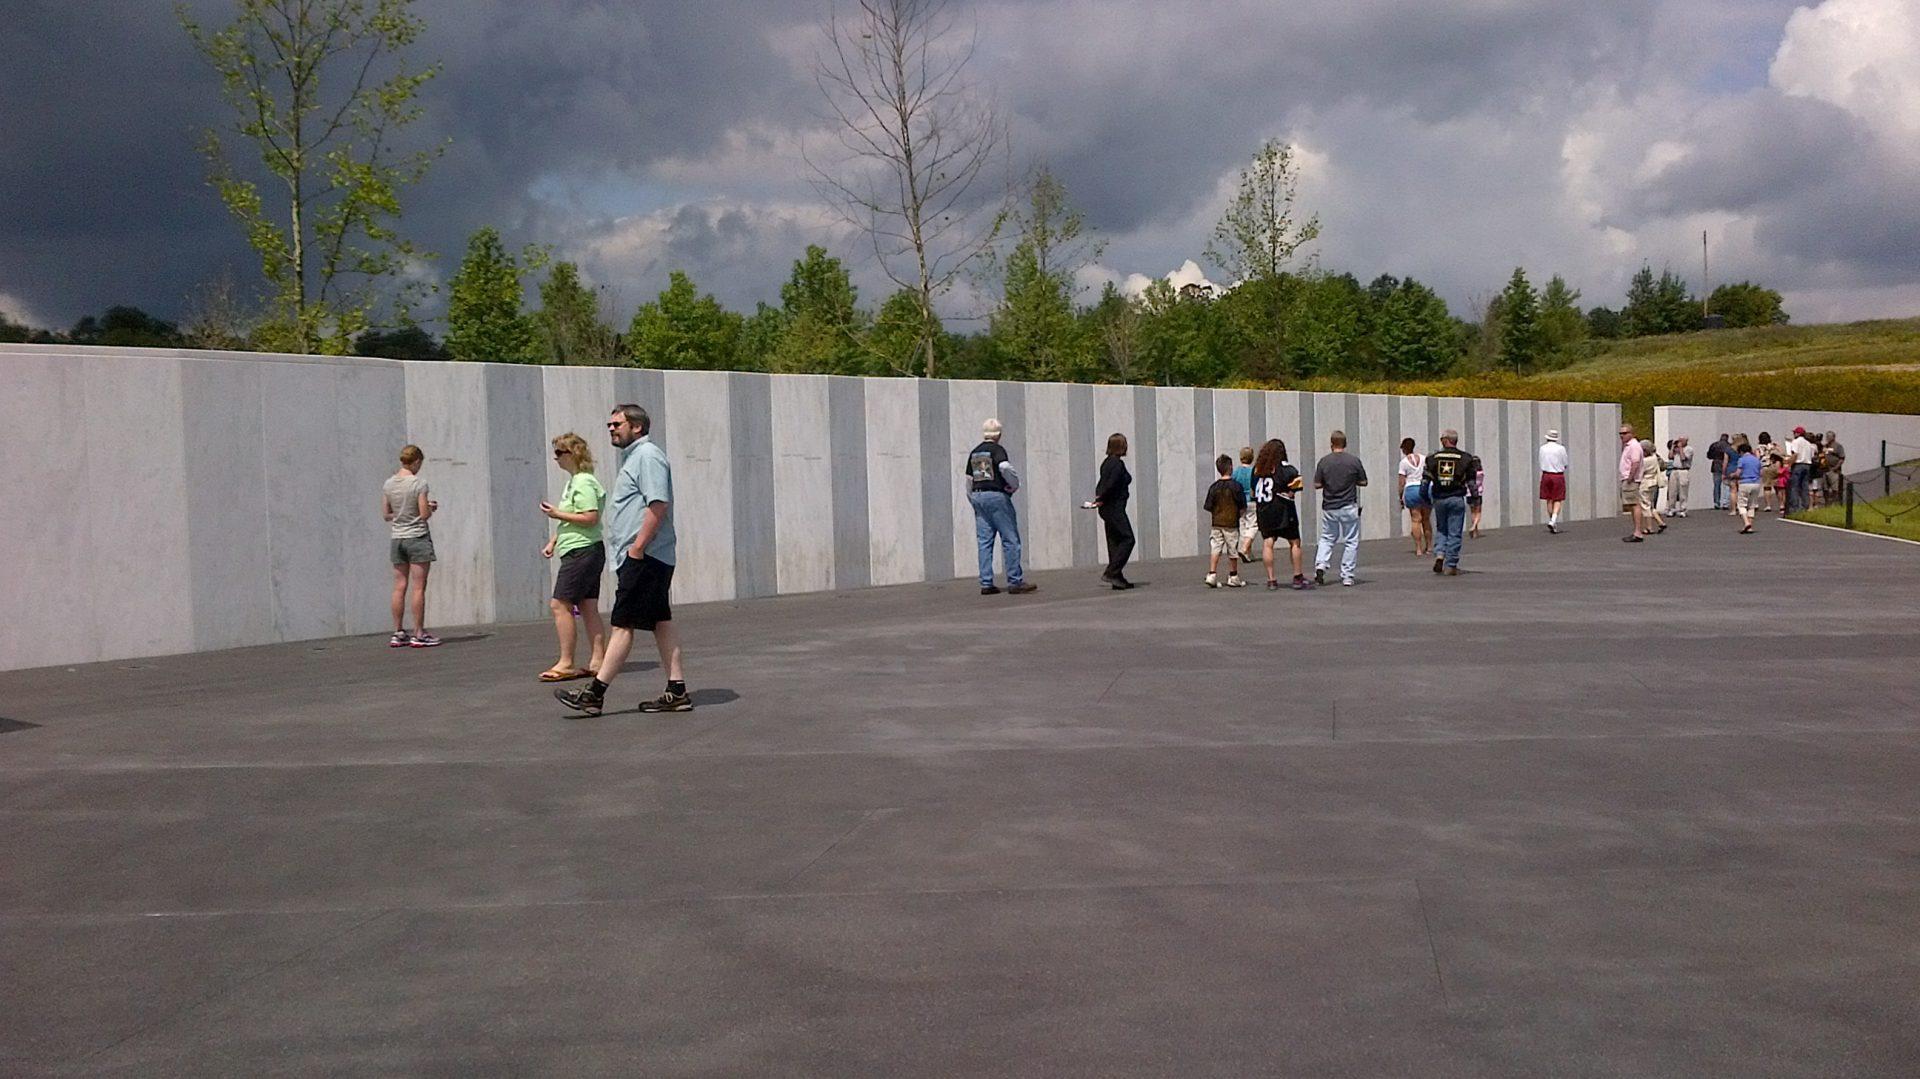 Flight 93 National Memorial Hosts Special Veterans Day Exhibit